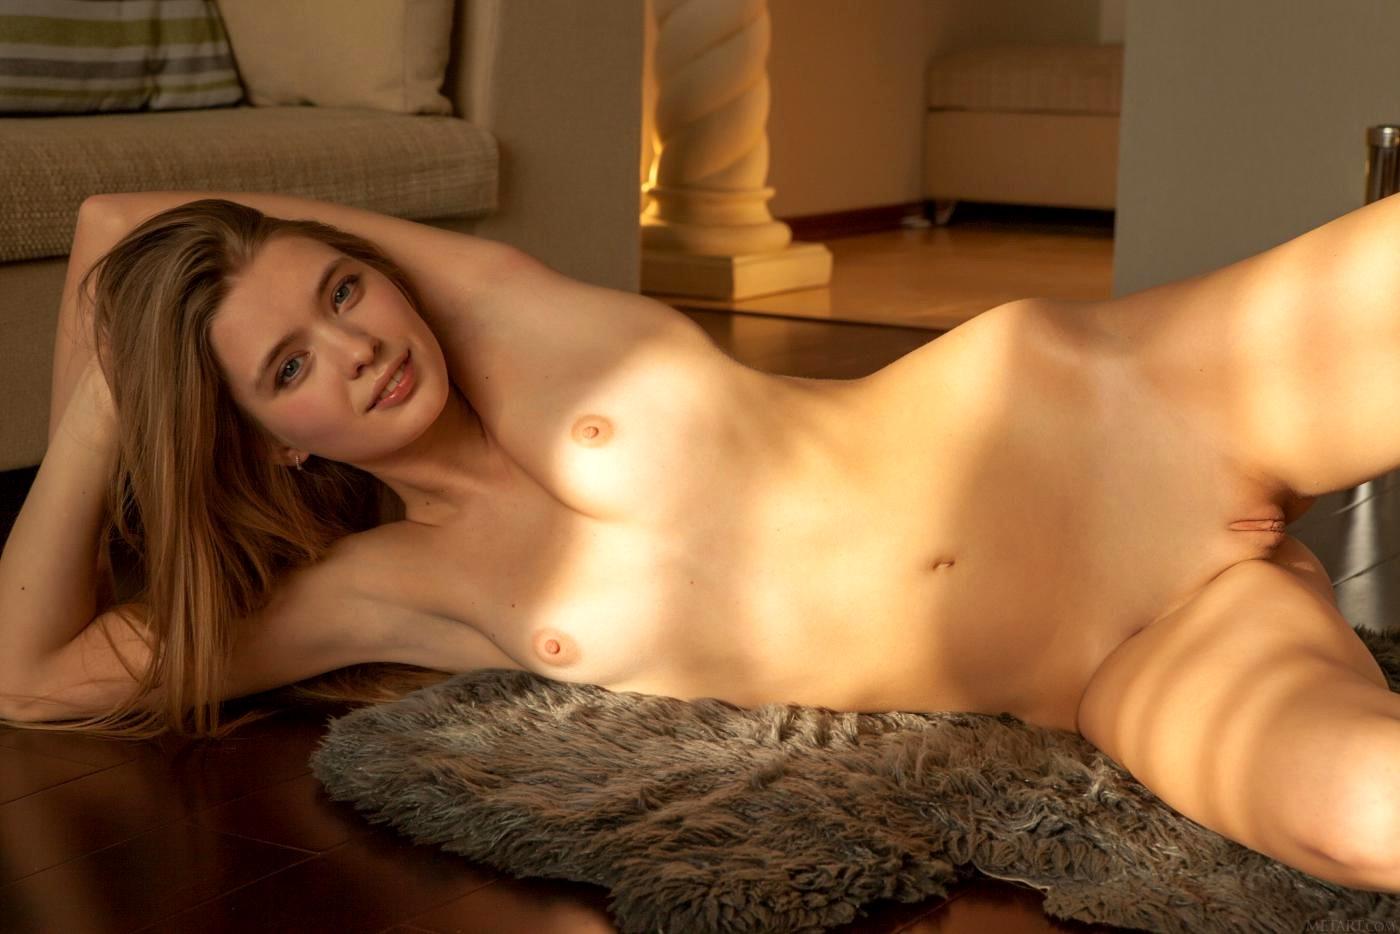 Sigrid thornton breasts scene in snapshot